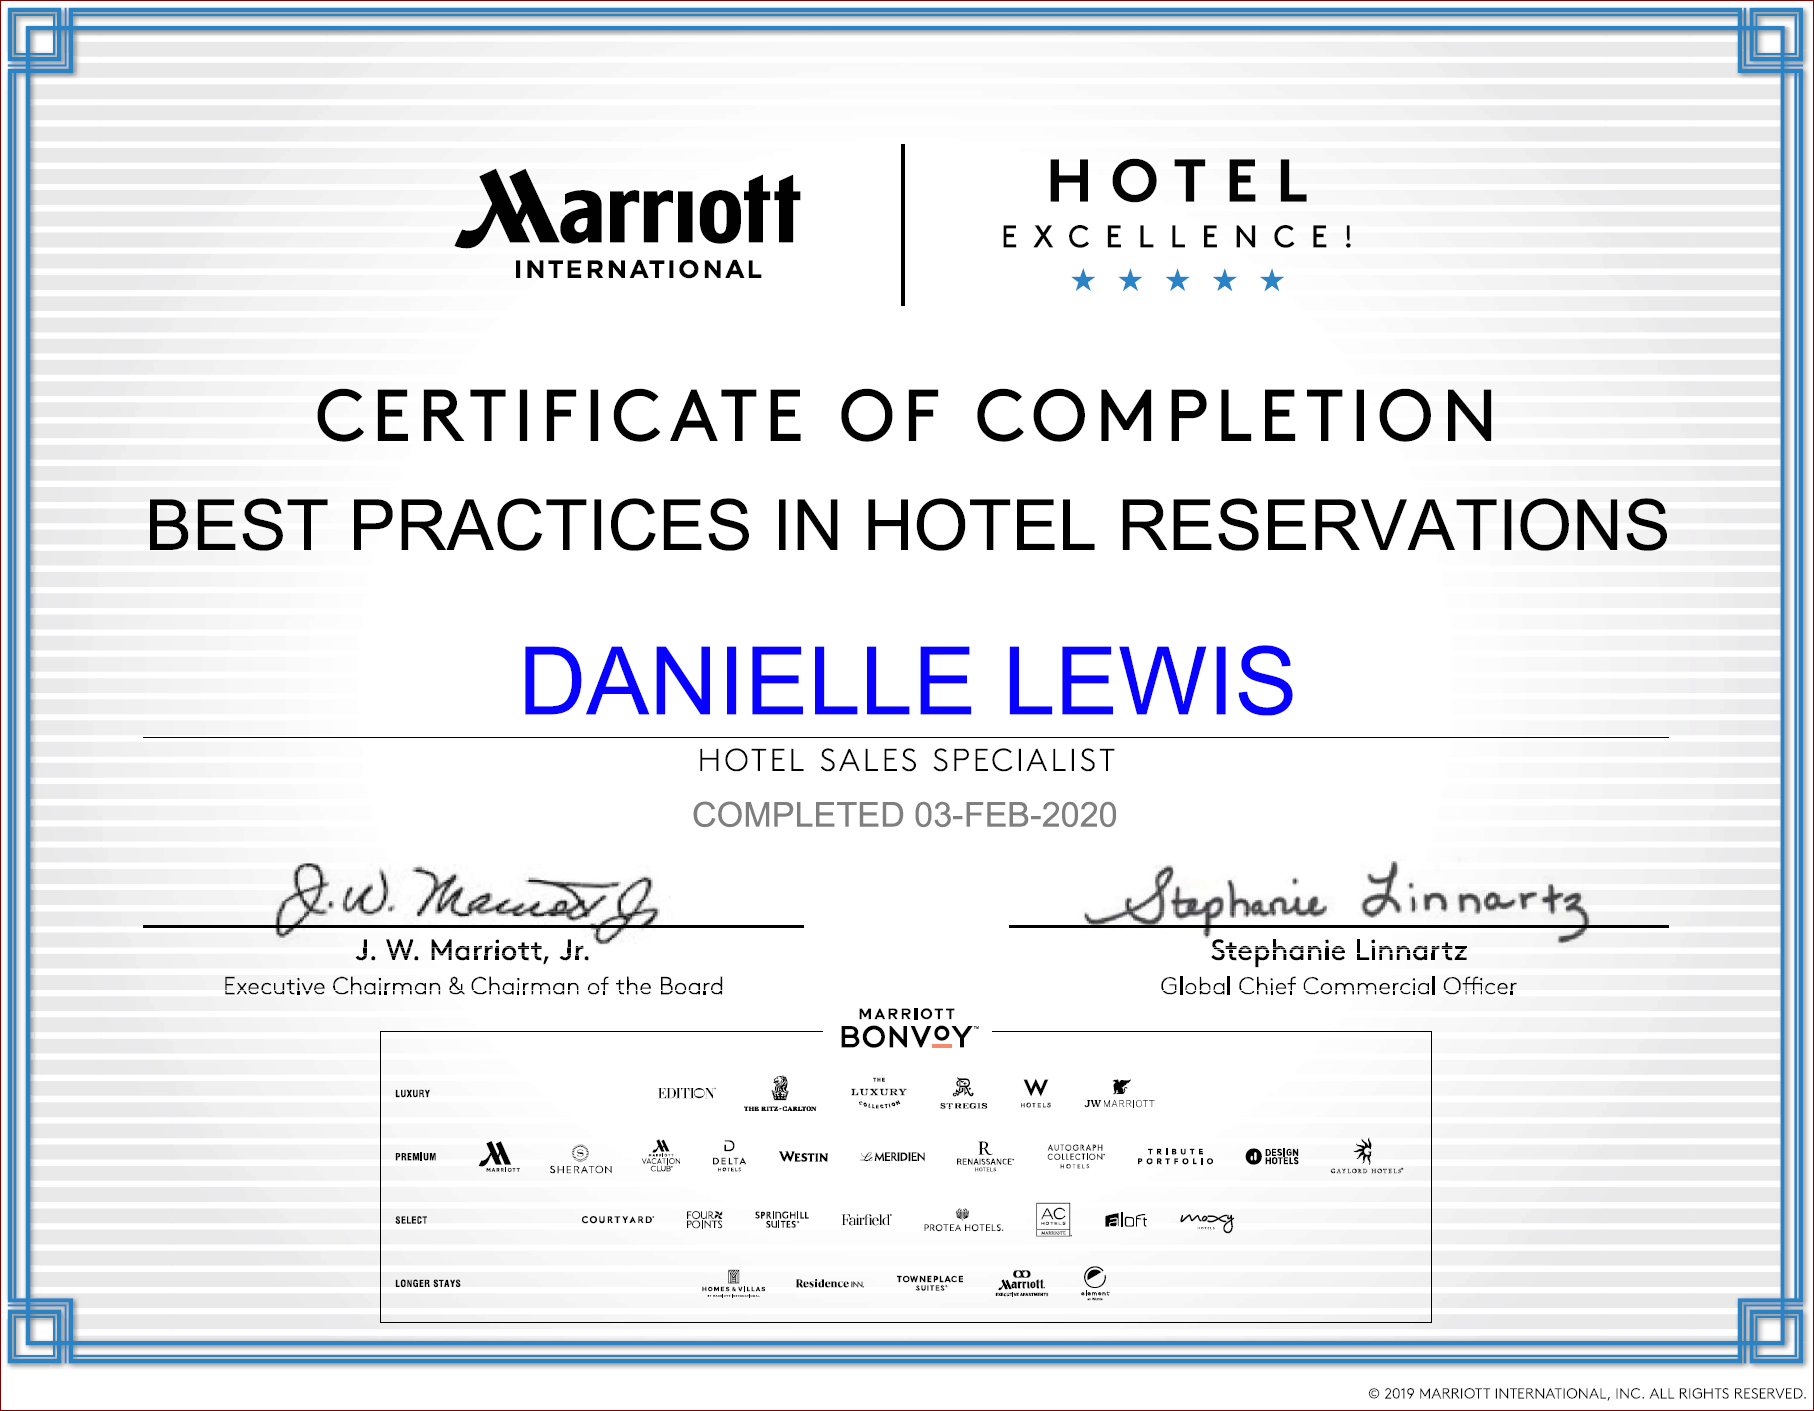 SelfishMe Travel - Marriott International Best Practices in Hotel Reservations Certificate